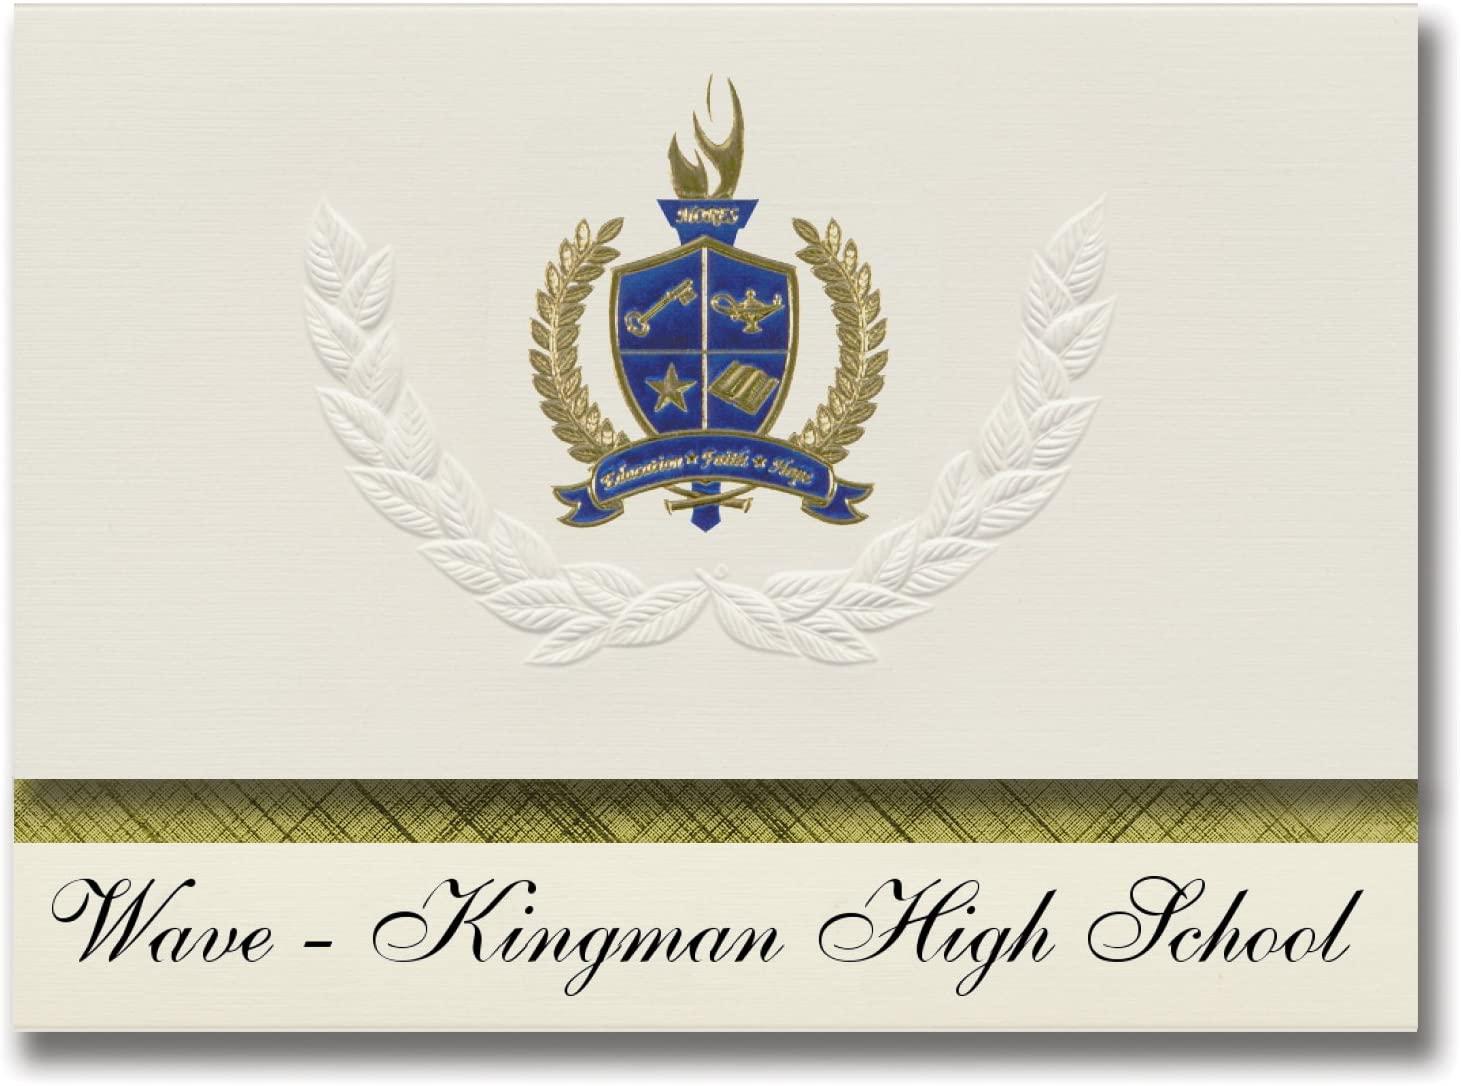 Signature Announcements Wave - Kingman High School (Kingman, AZ) Graduation Announcements, Presidential style, Elite package of 25 with Gold & Blue Metallic Foil seal